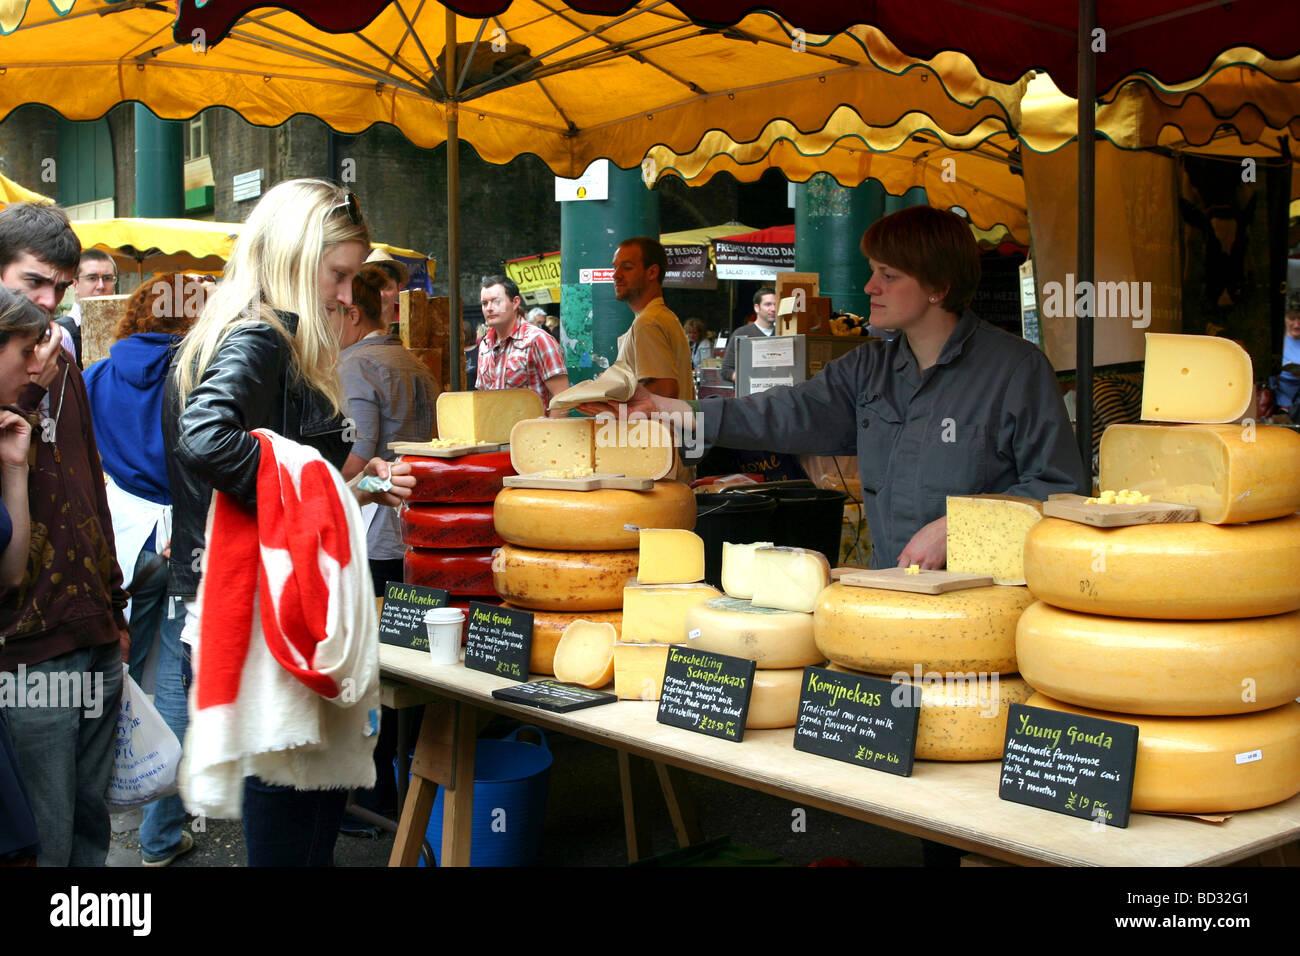 Borough Market Cheese Seller, Borough, London - Stock Image